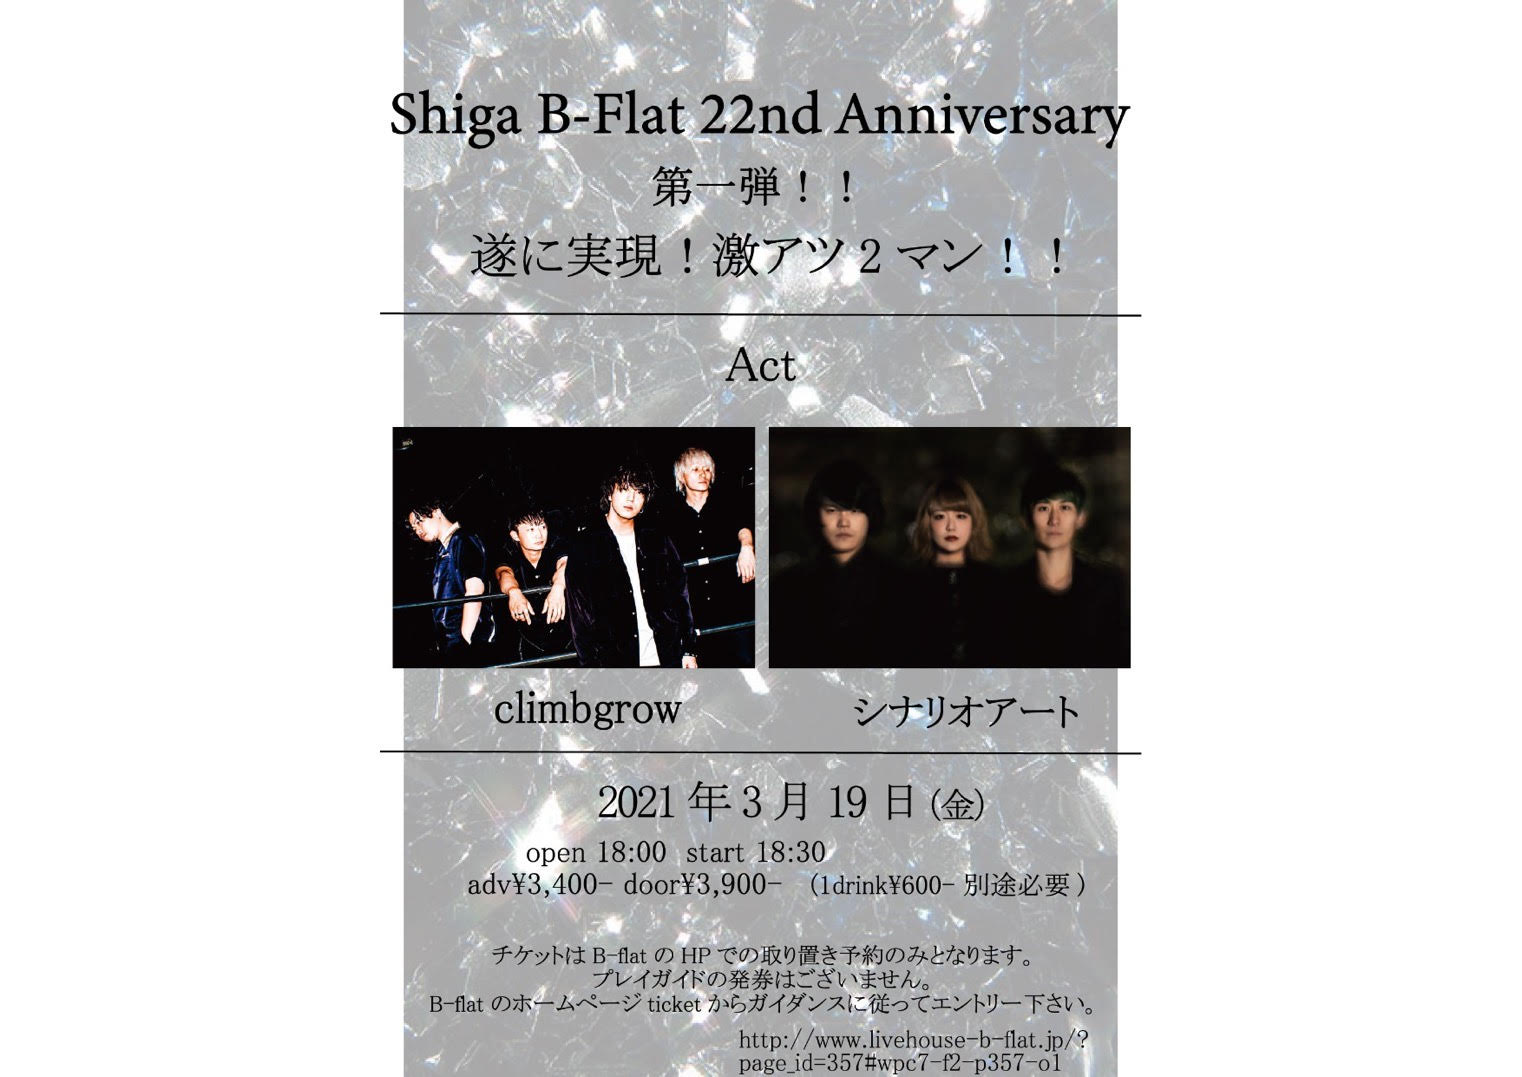 Shiga B-Flat 22nd Anniversary 第一弾!!